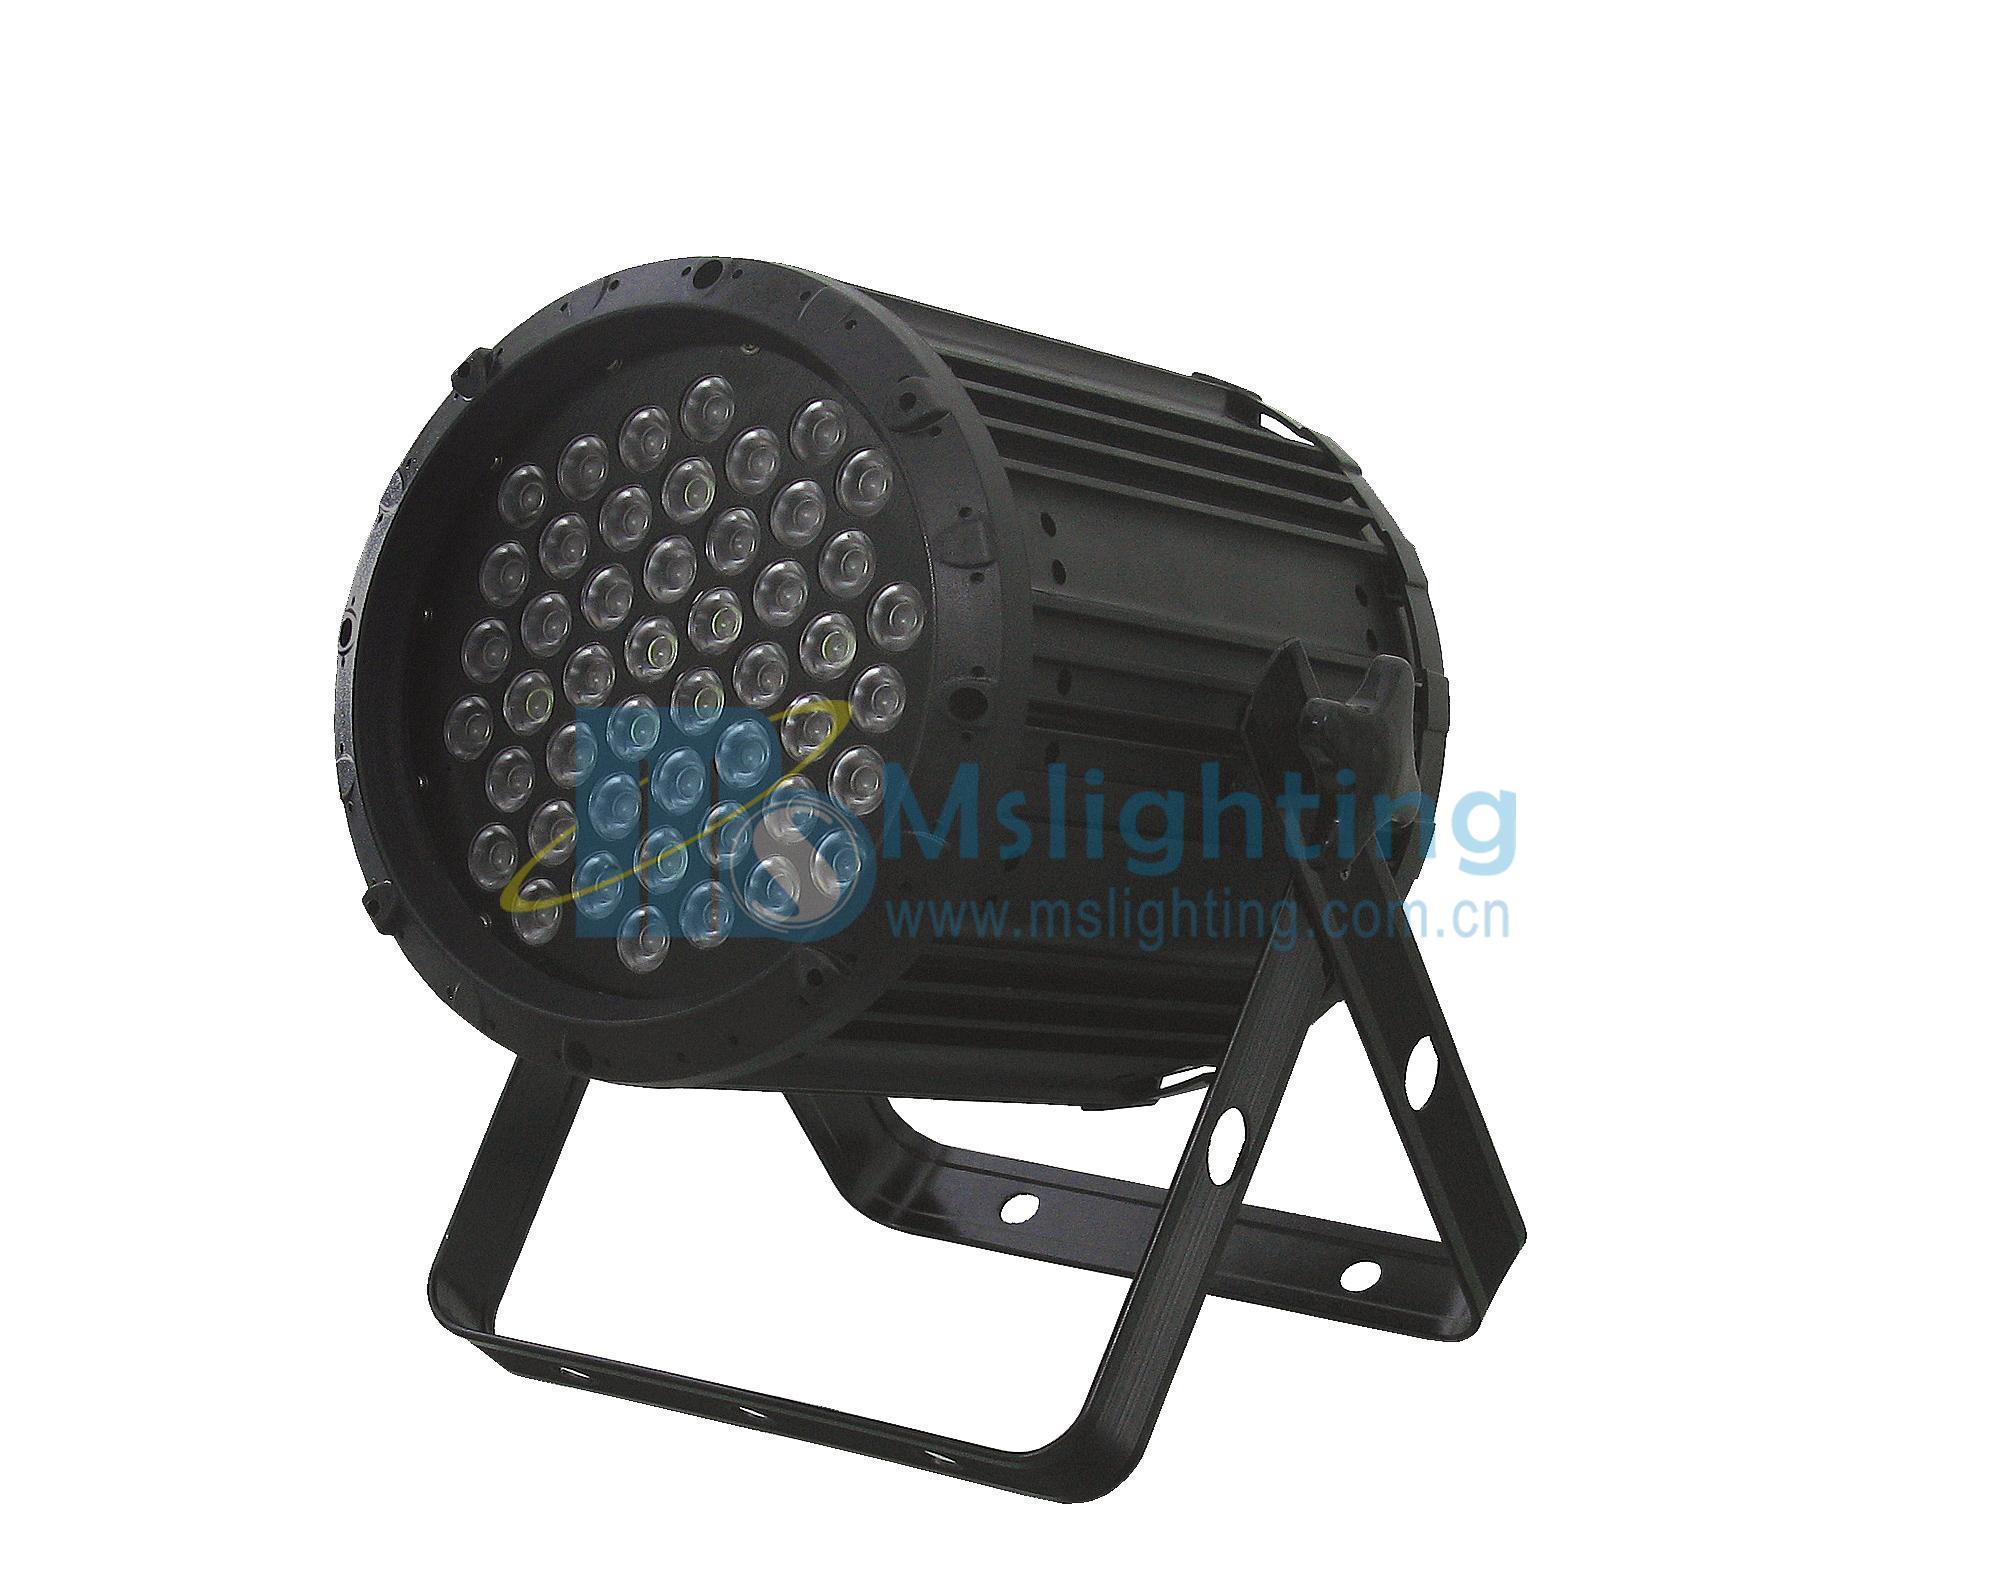 48*1W/3W LED Stage Light / Spotlight LED Wall Washer Light